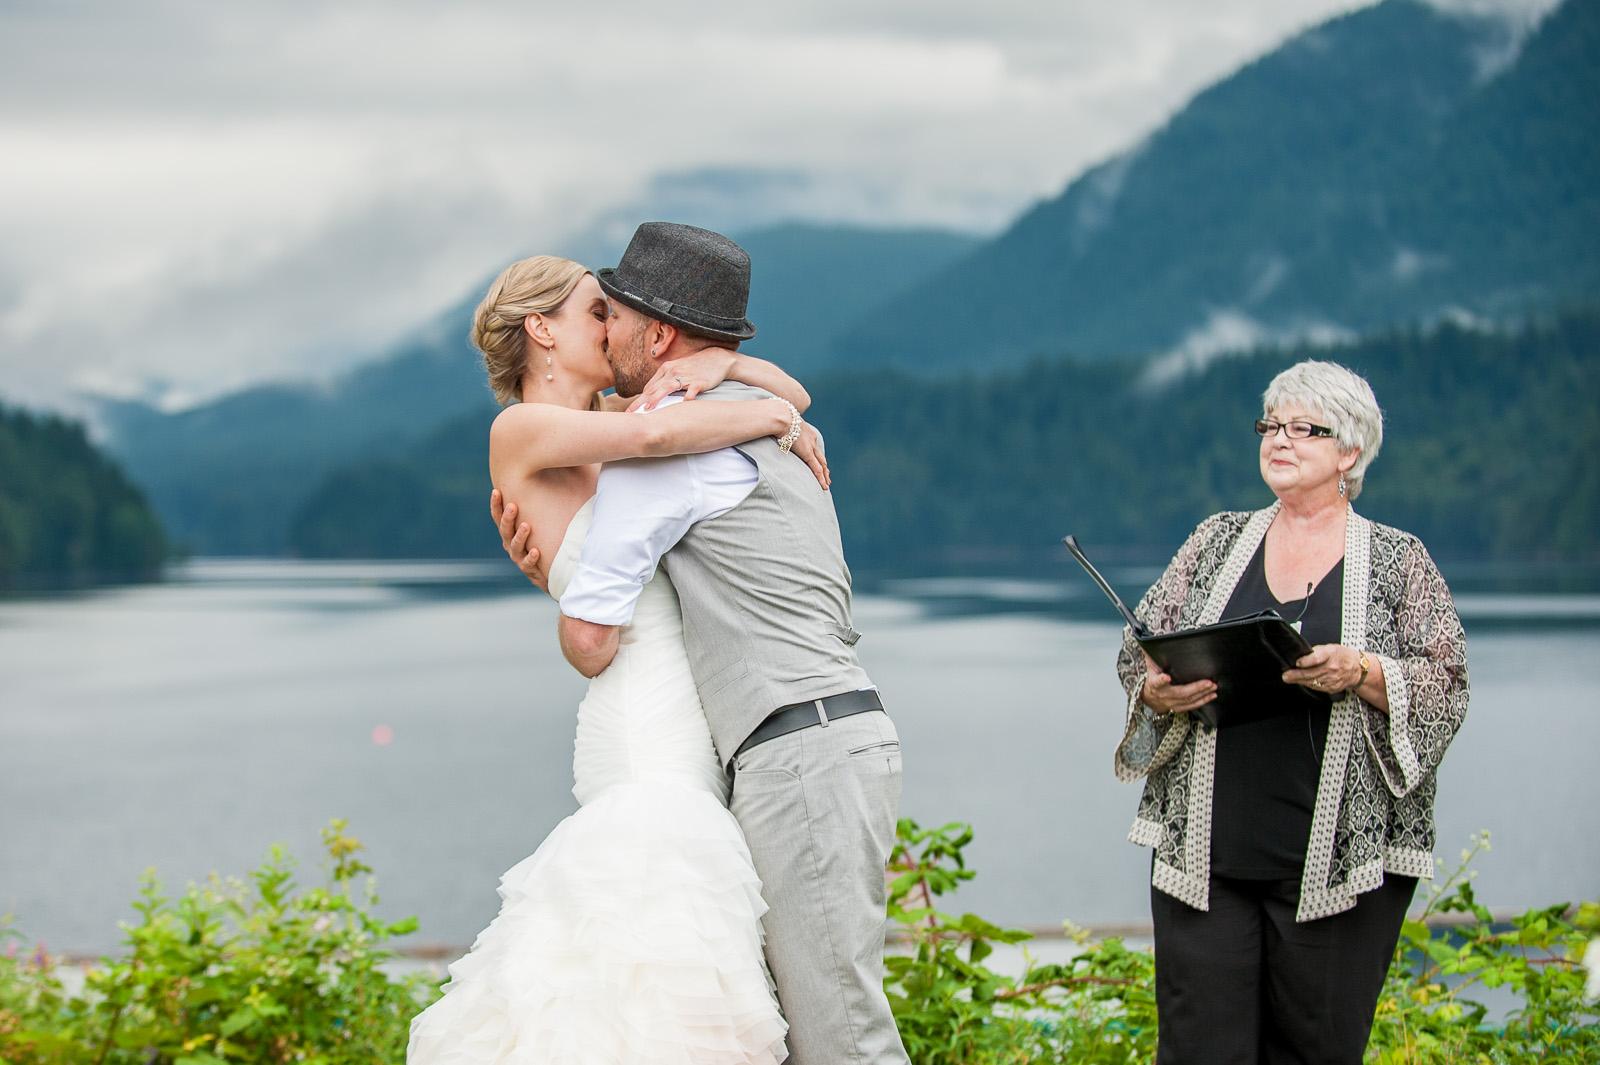 bc-wedding-photographers-cleveland-dam-wedding-11.jpg